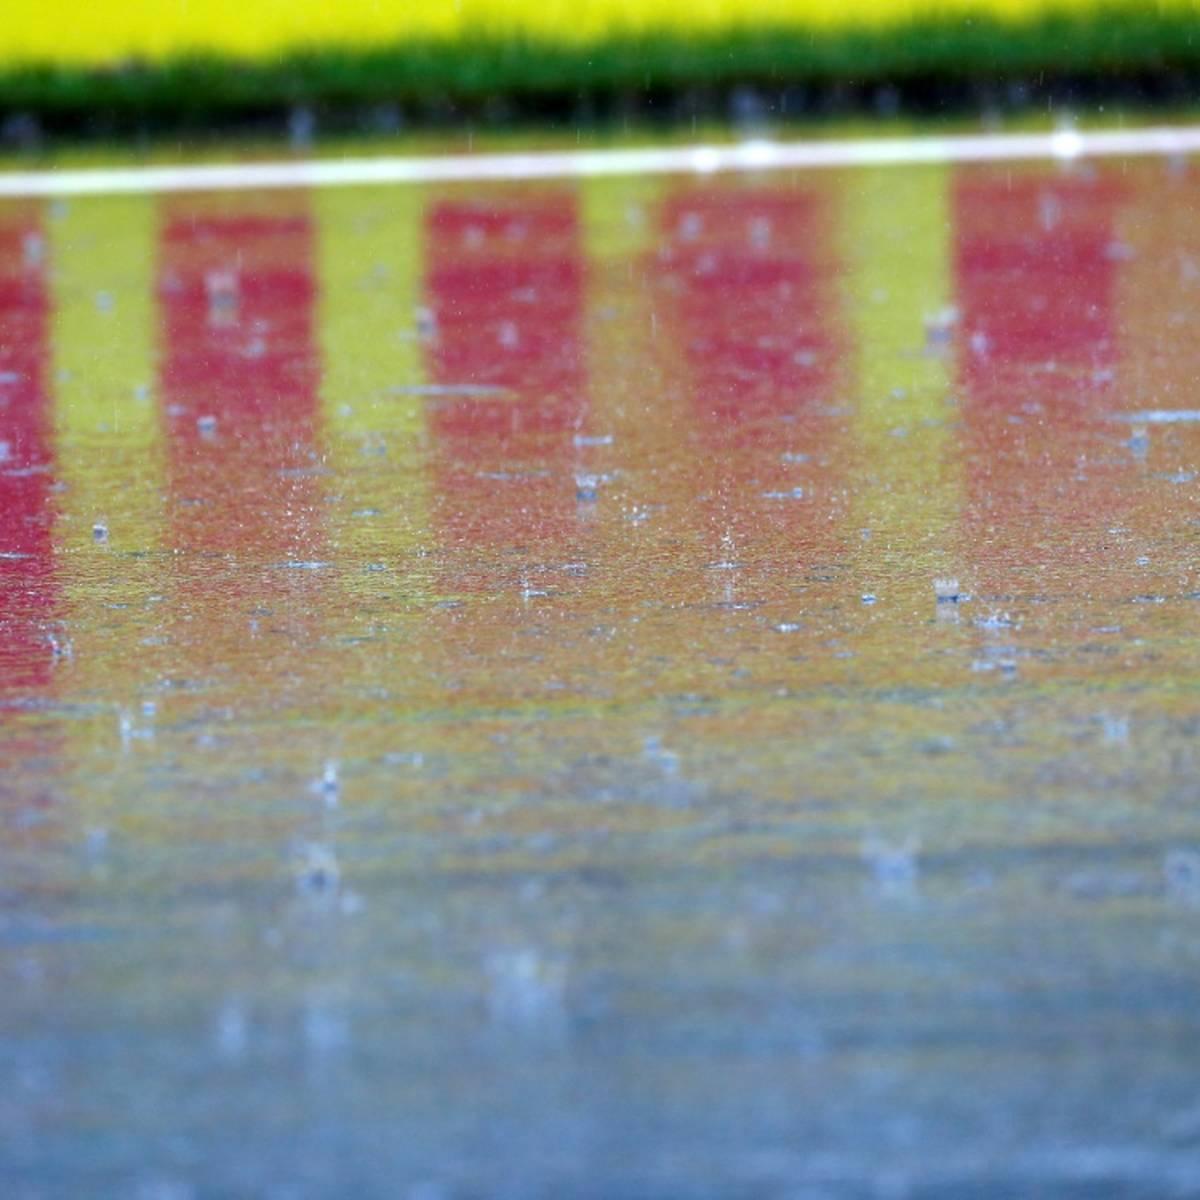 Starkregen in Sotschi: F2-Rennen verschoben